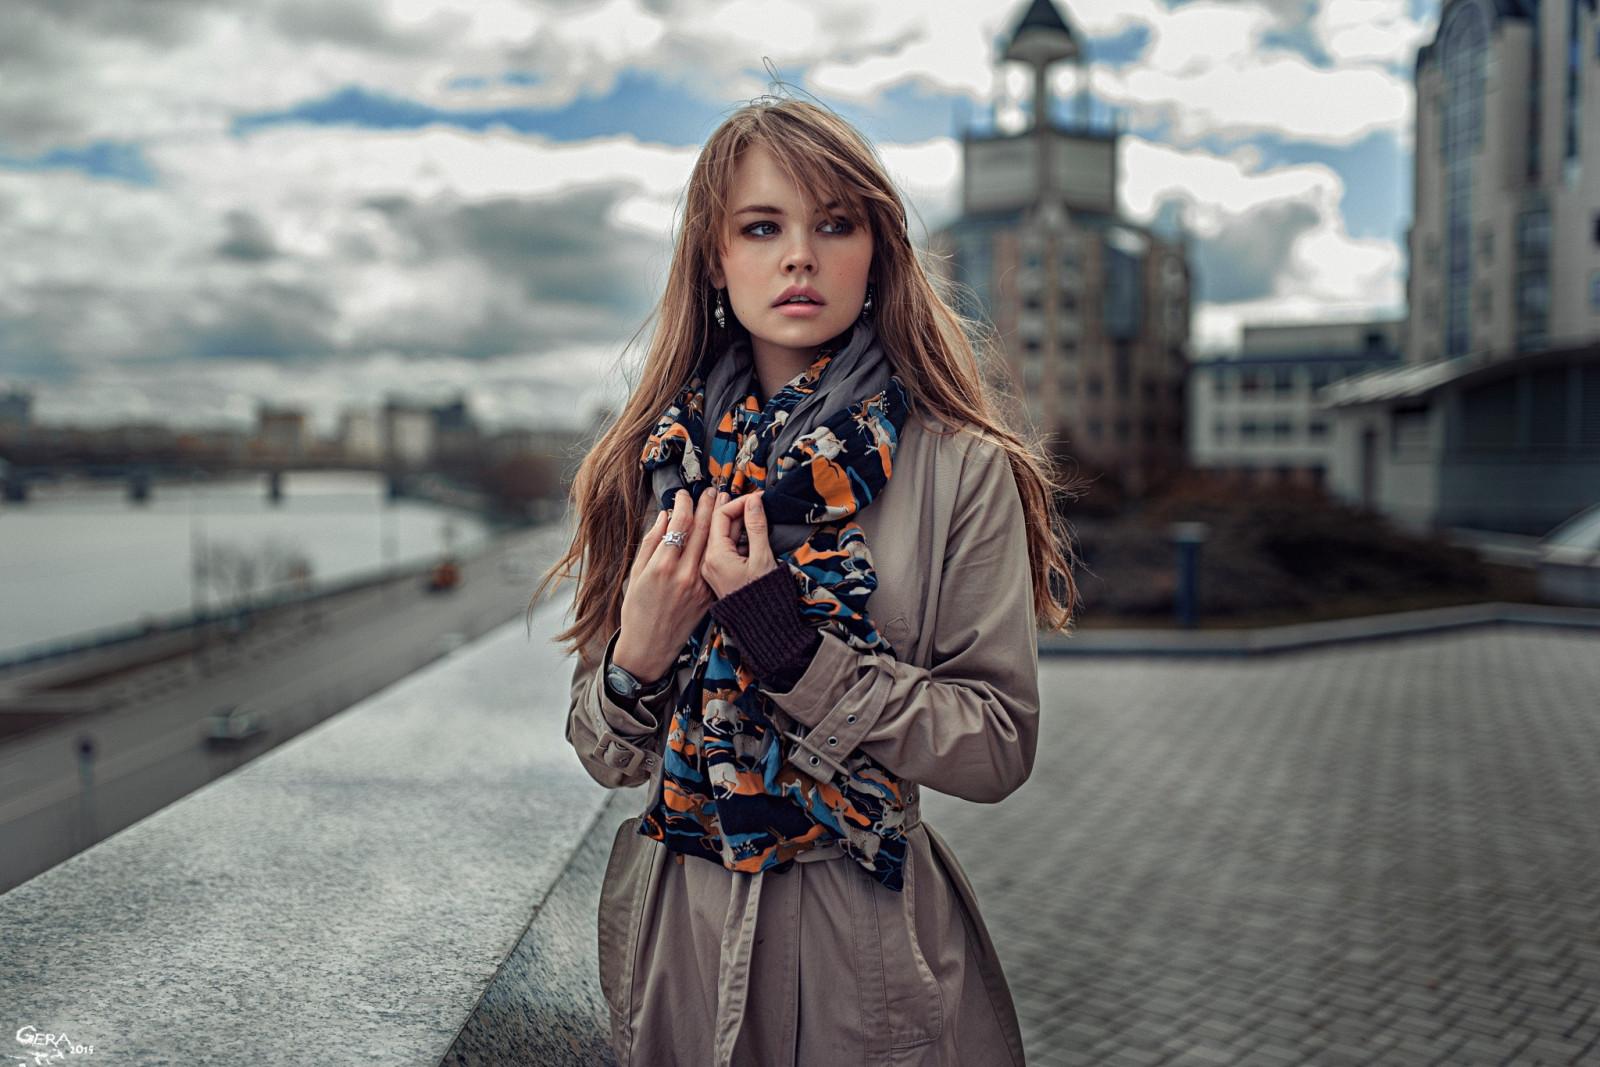 model, winter, Anastasia Scheglova, dress, blue, fashion, spring, clothing, girl, beauty, lady, snapshot, photo shoot